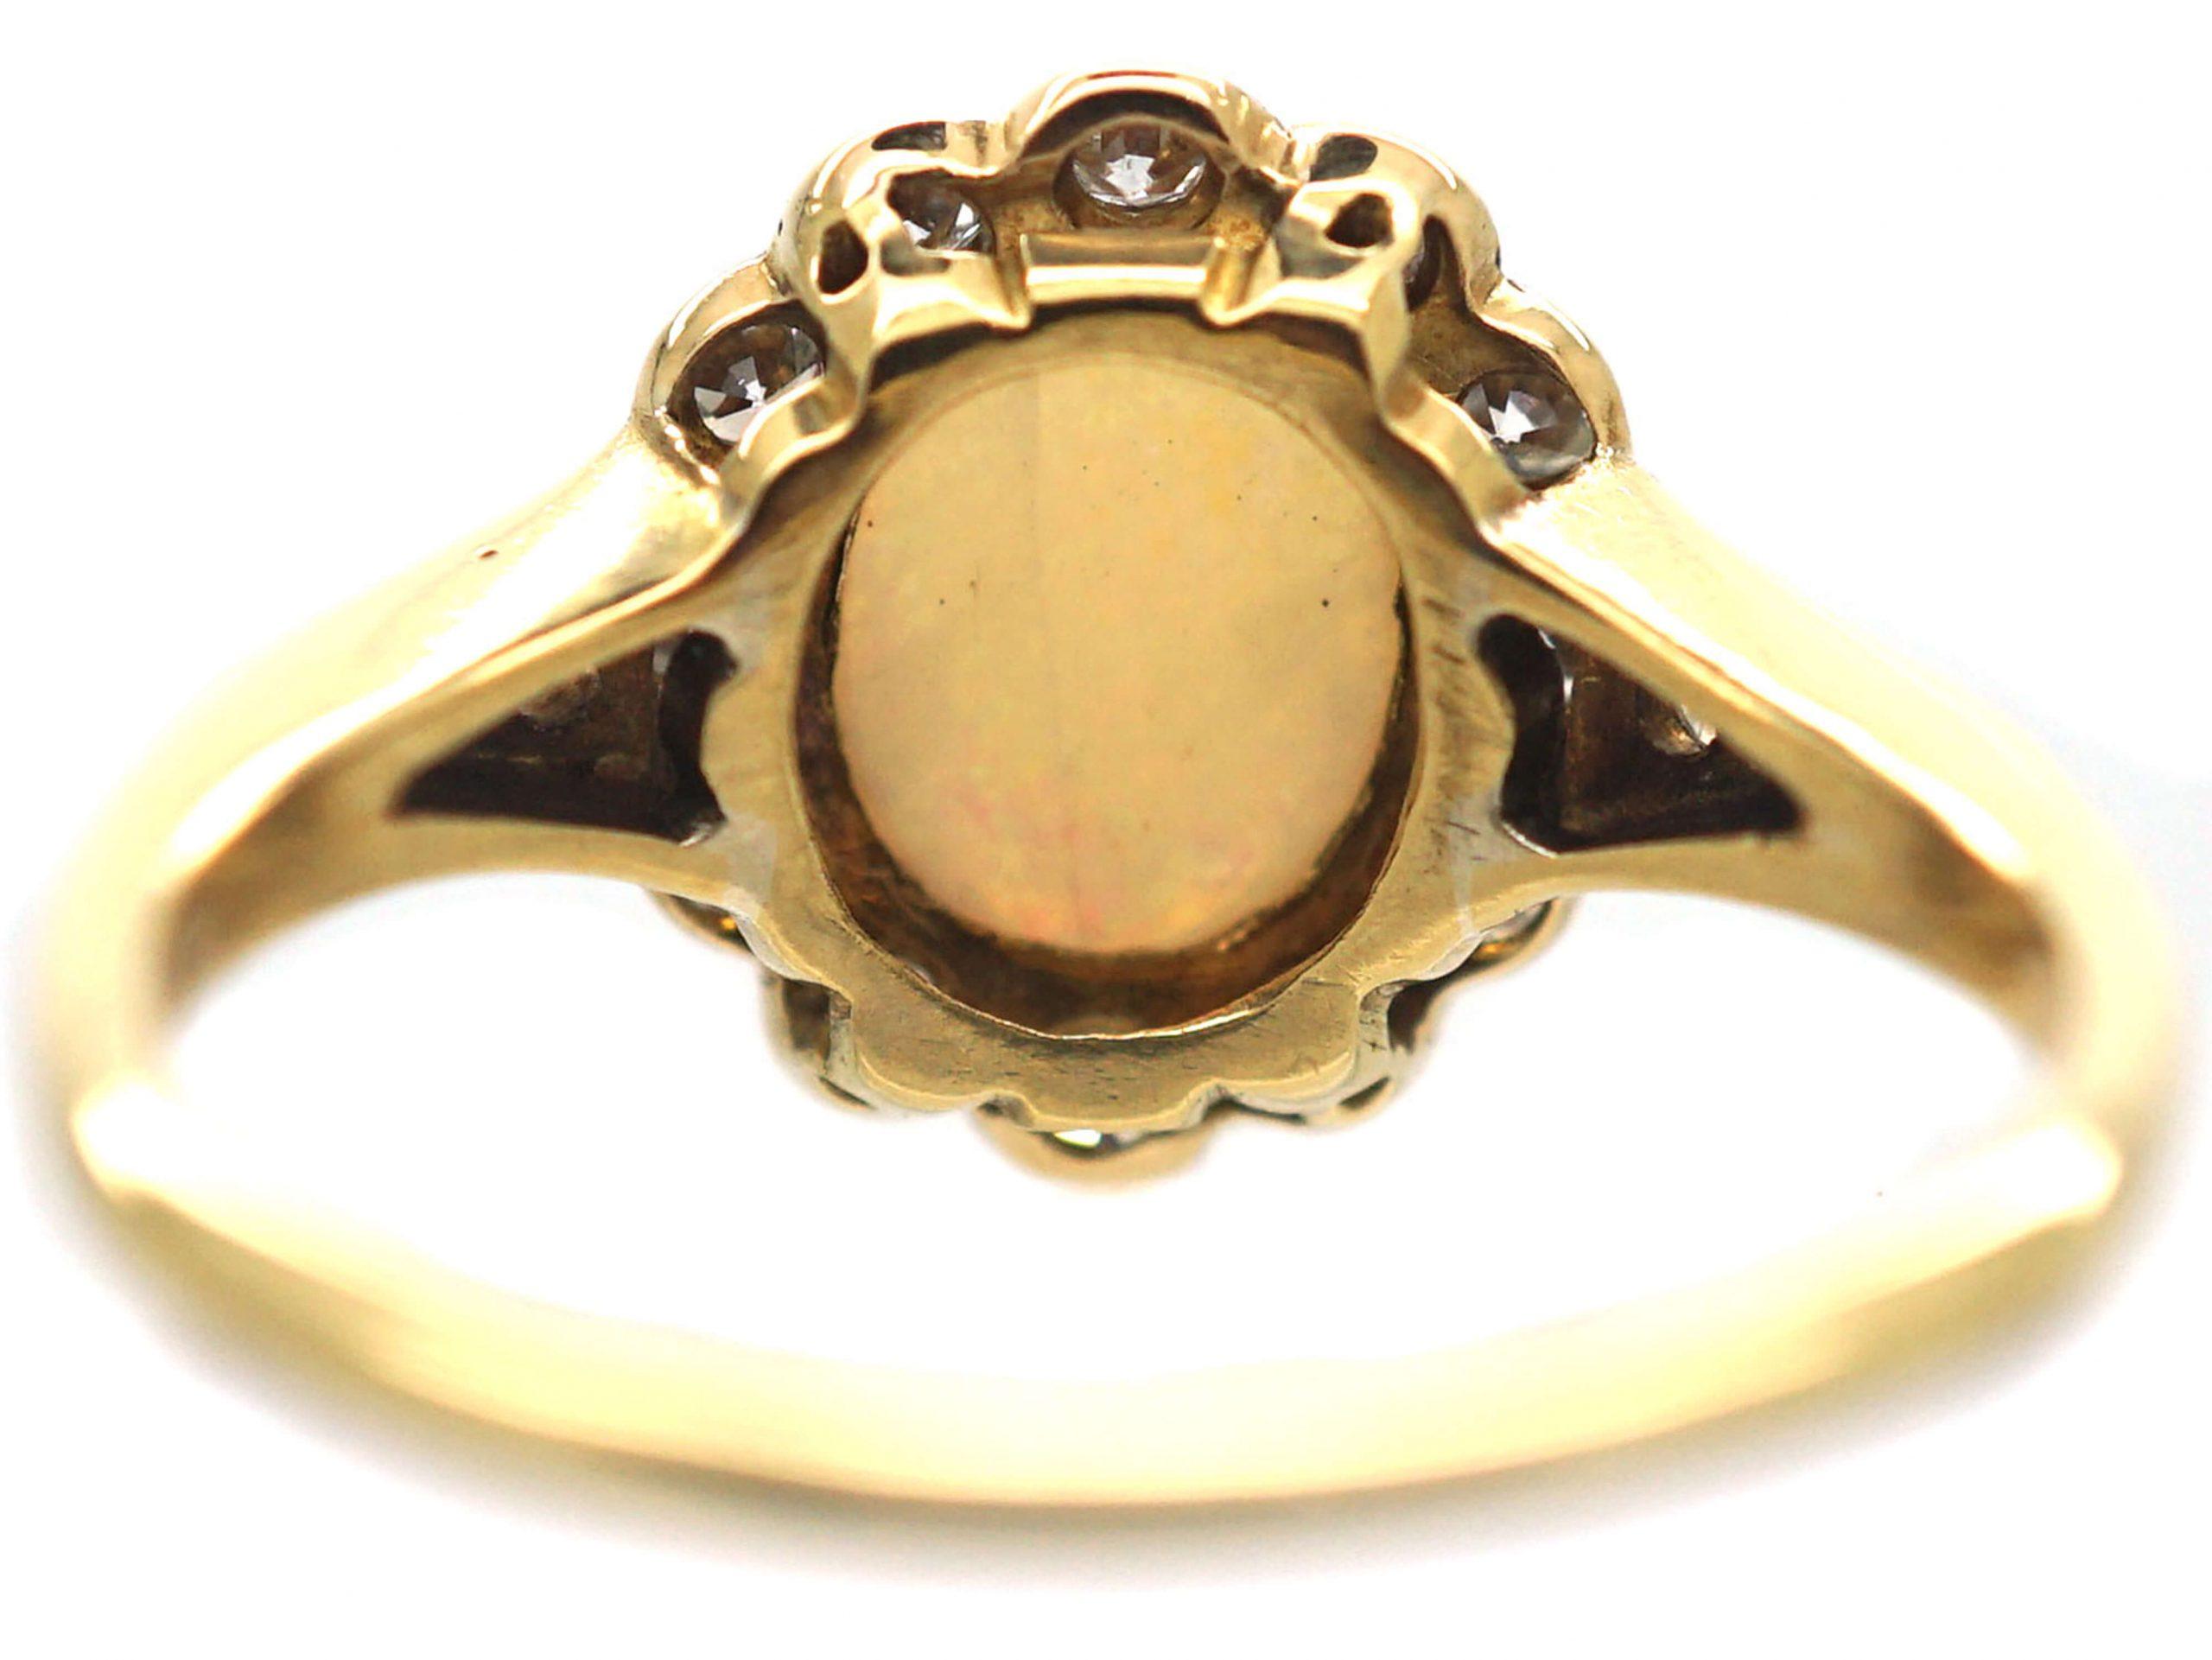 Edwardian 18ct Gold & Platinum, Opal & Diamond Cluster Ring with Diamond Set Shoulders